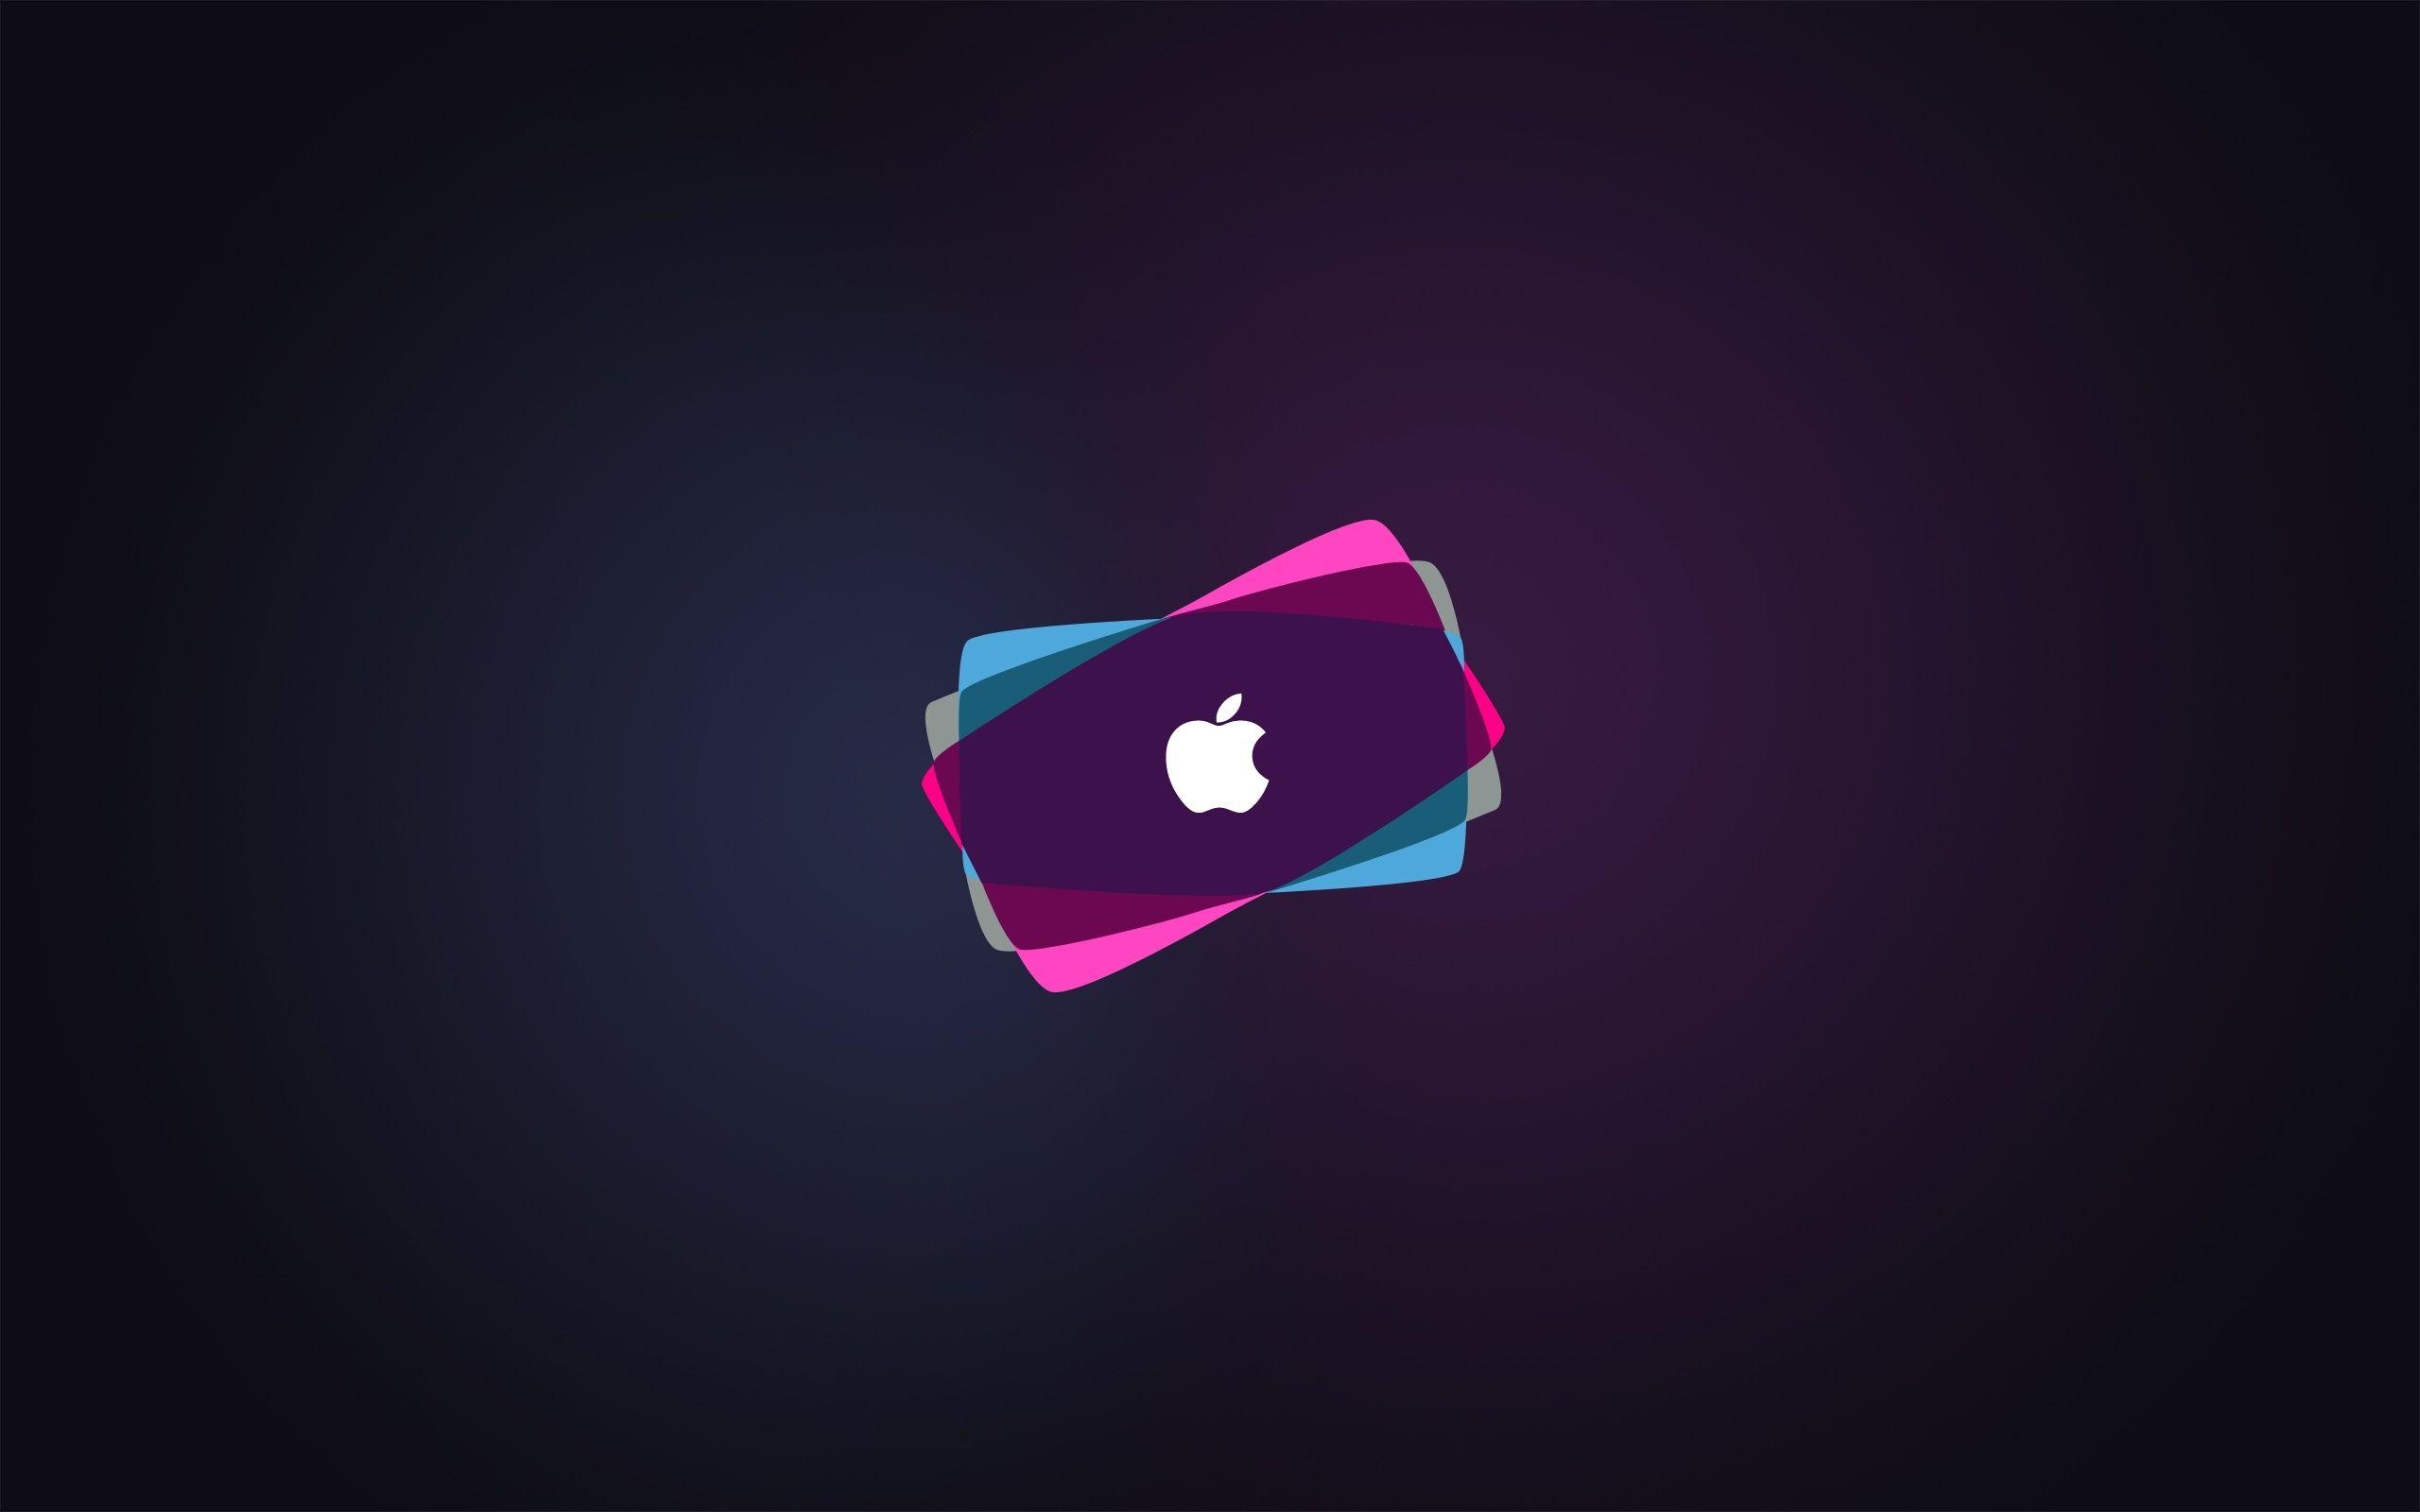 apple tv iphone panoramic wallpaper | tech | pinterest | apple tv